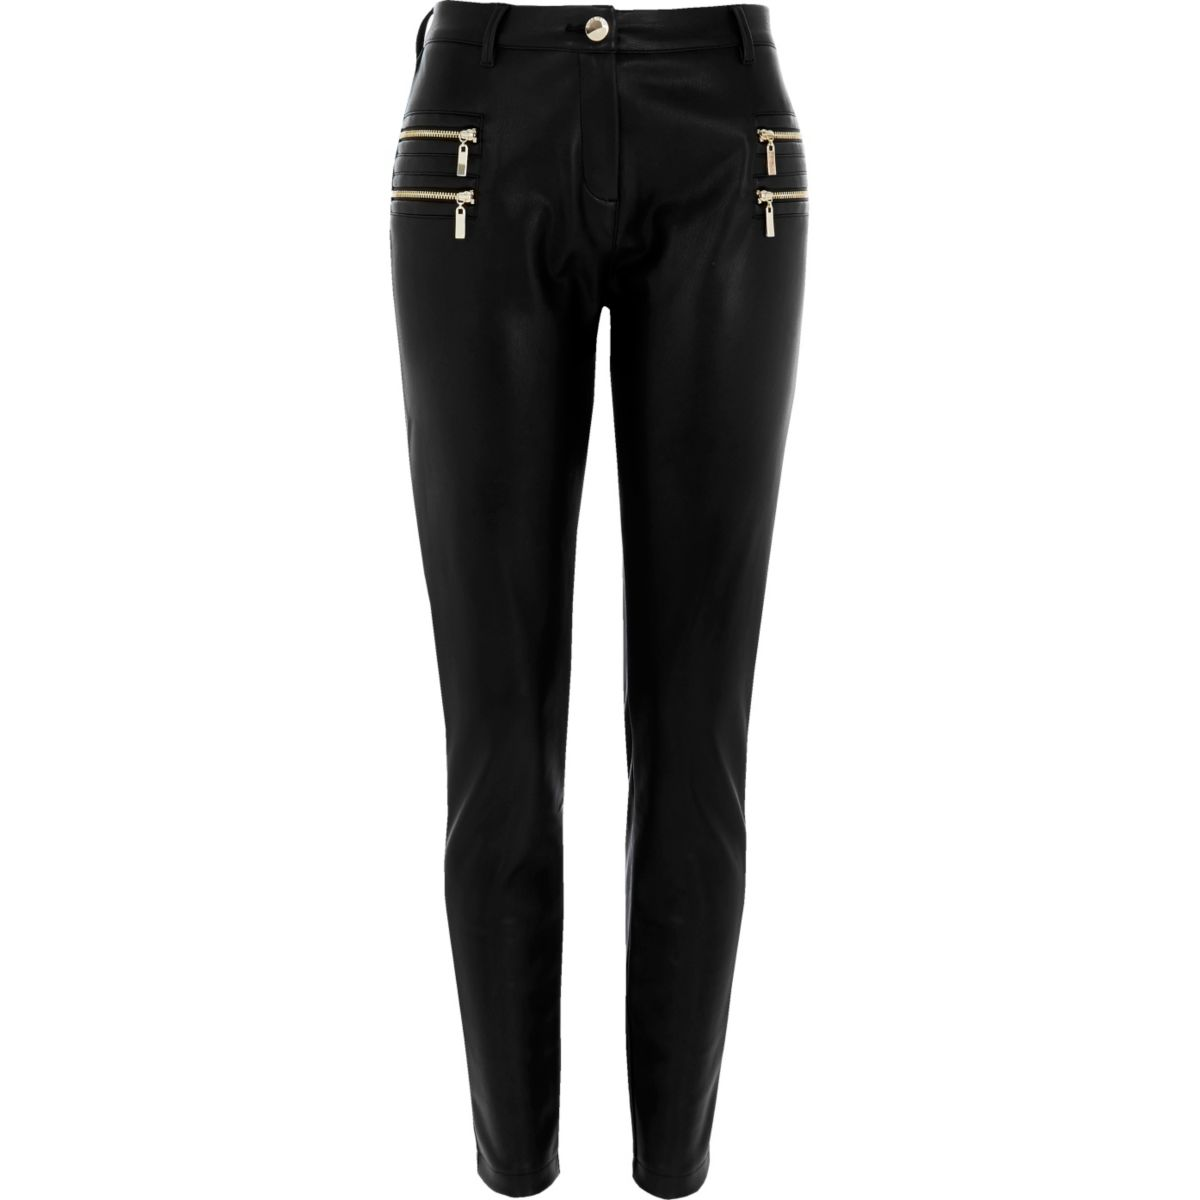 Black zip detail super skinny trousers